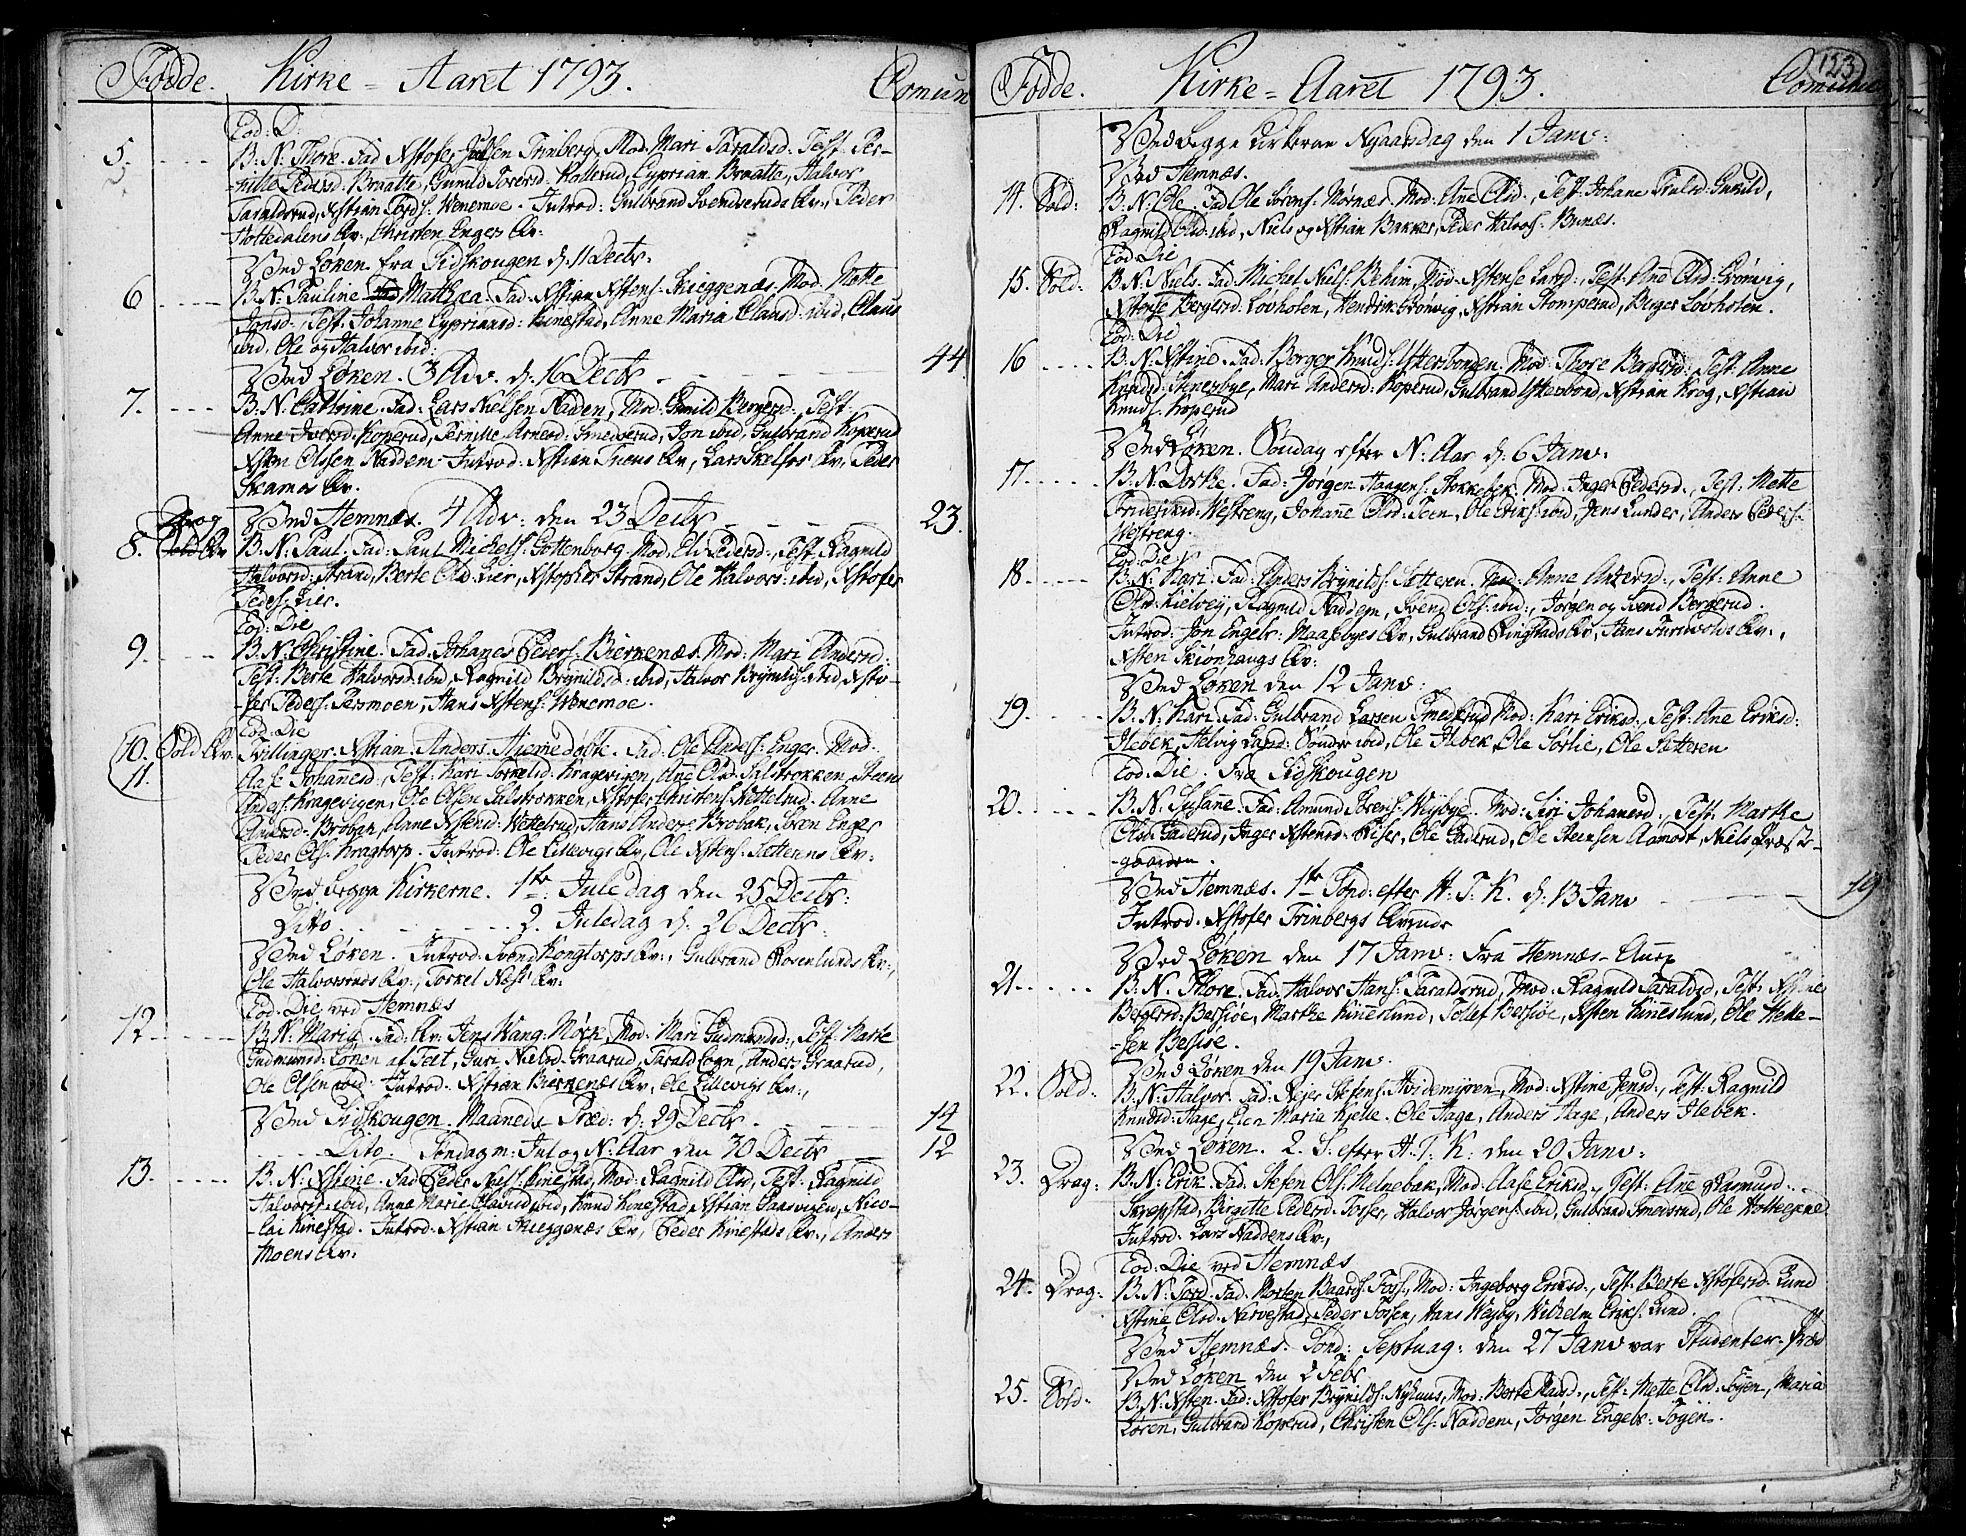 SAO, Høland prestekontor Kirkebøker, F/Fa/L0005: Ministerialbok nr. I 5, 1780-1793, s. 123